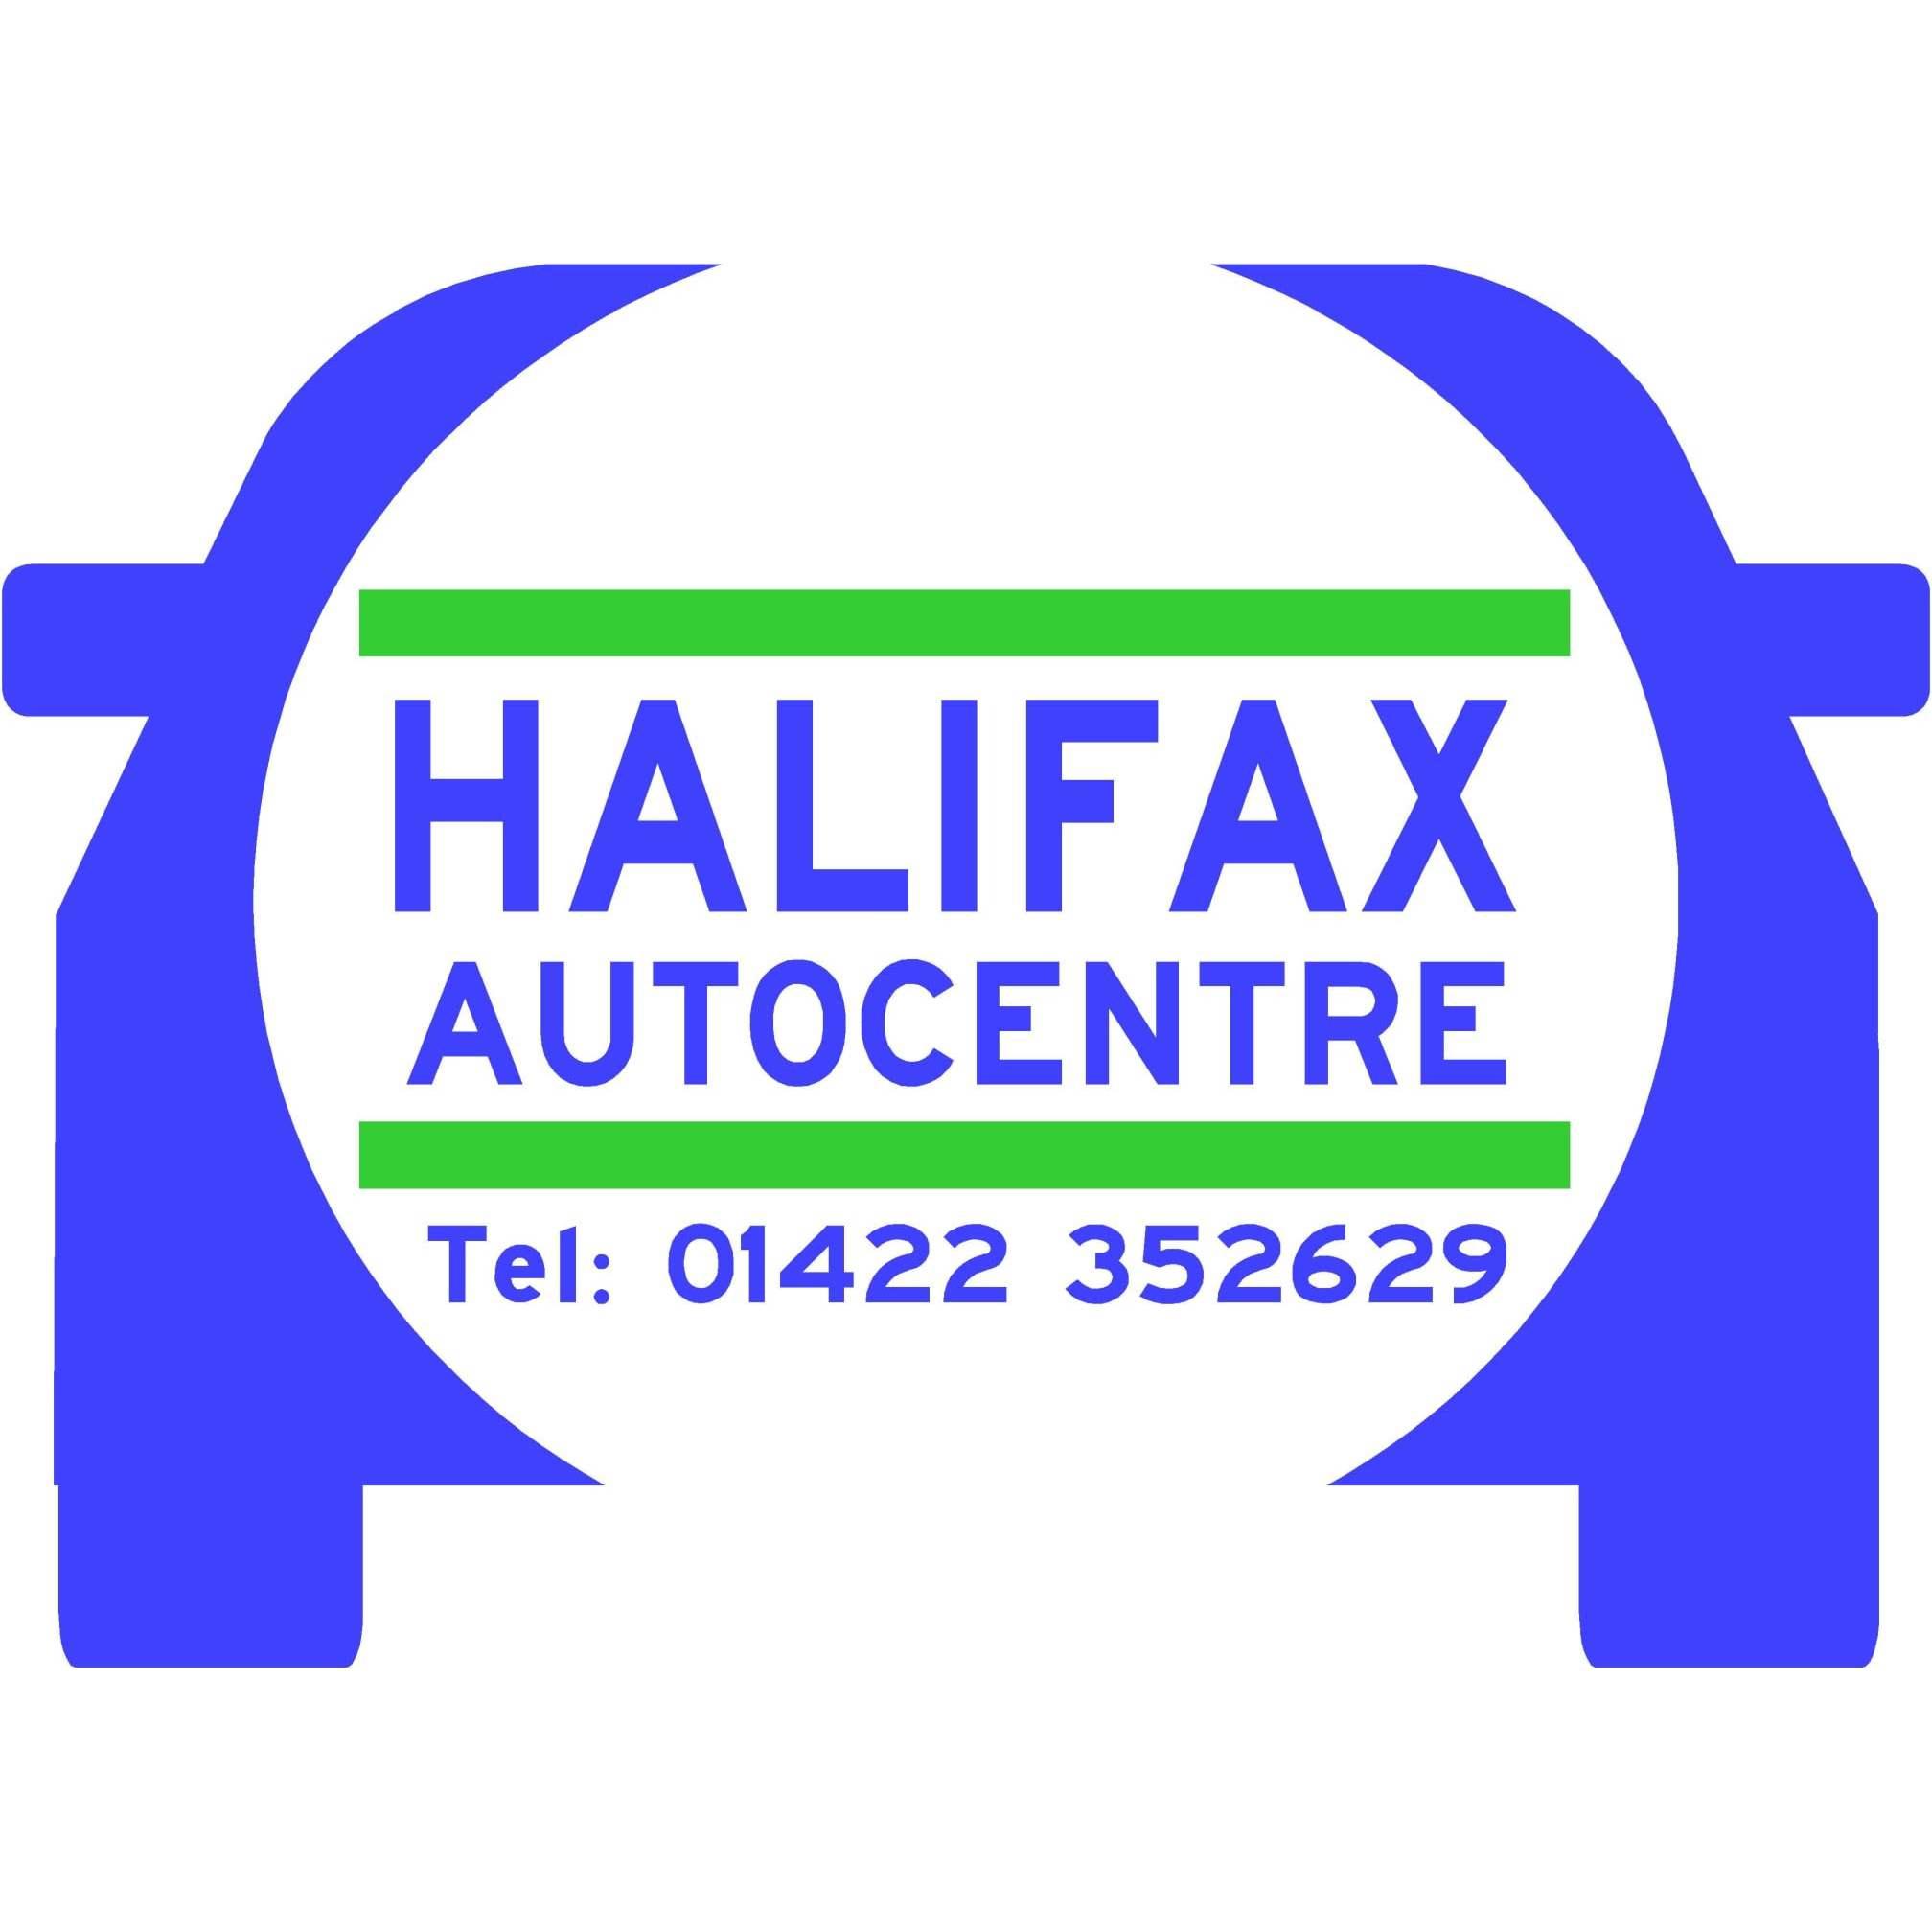 Halifax Autocentre - Halifax, West Yorkshire HX1 2LY - 01422 352629 | ShowMeLocal.com